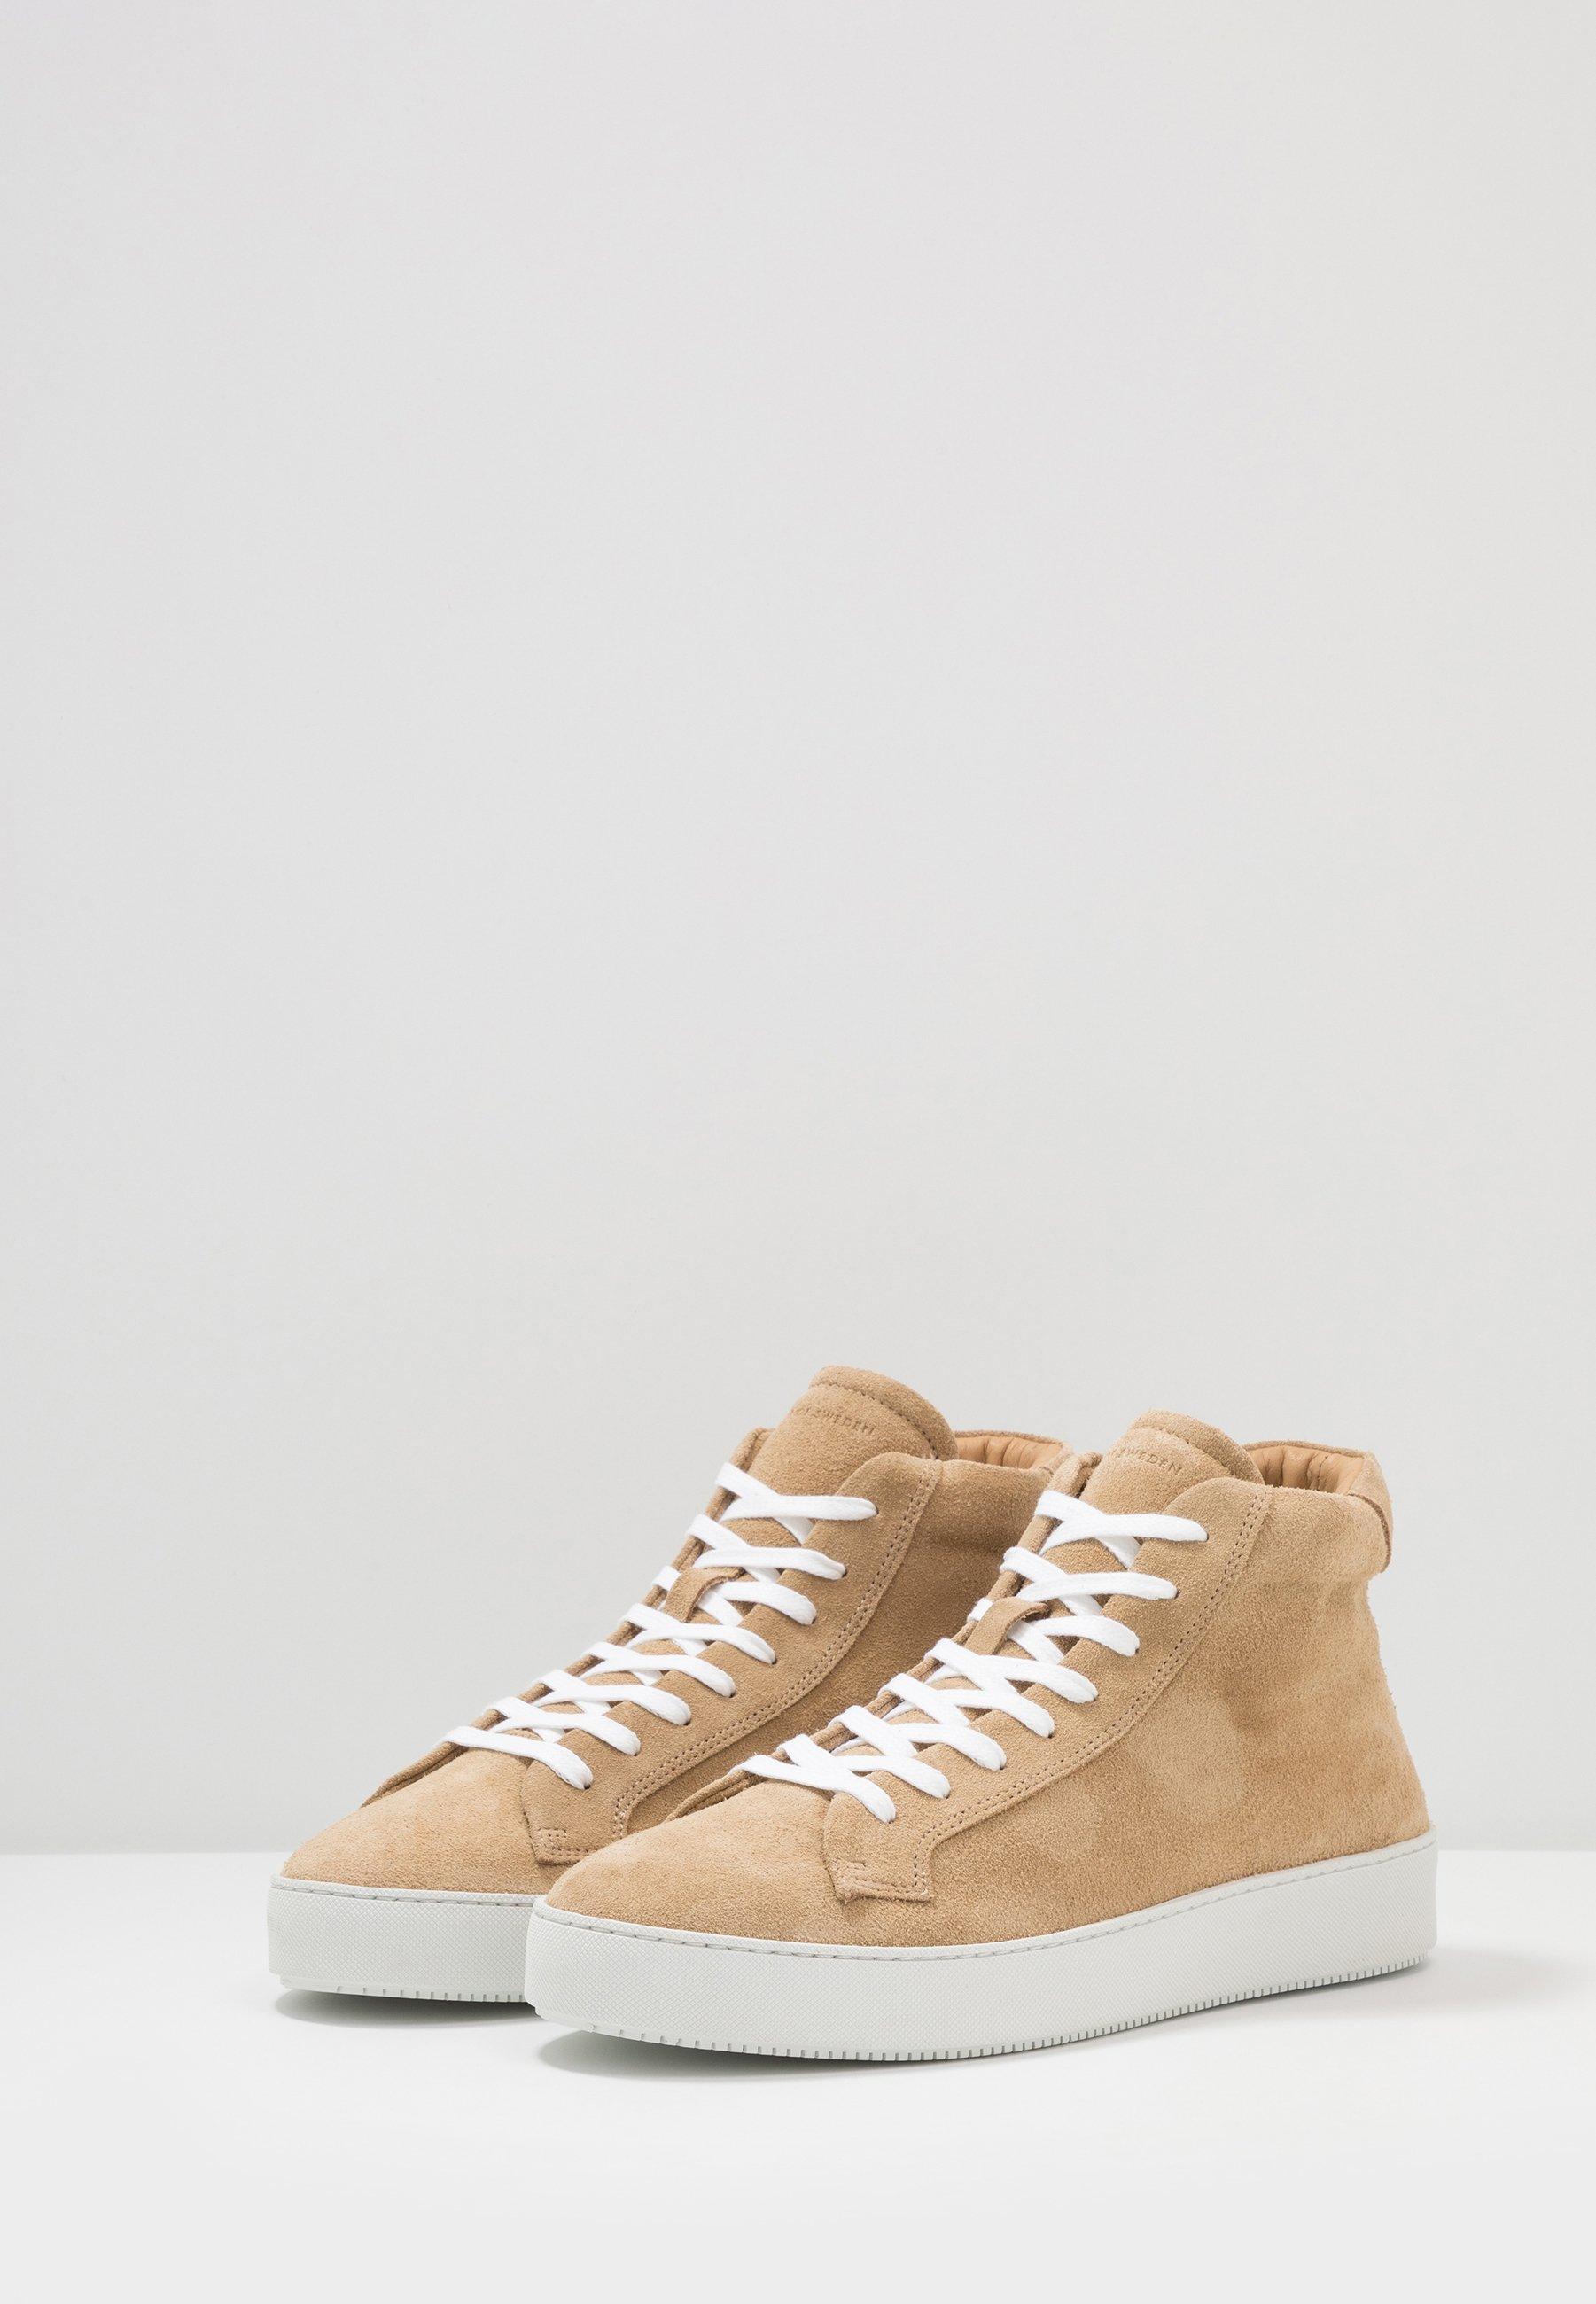 Tiger Of Sweden Salas - Höga Sneakers Macchiato